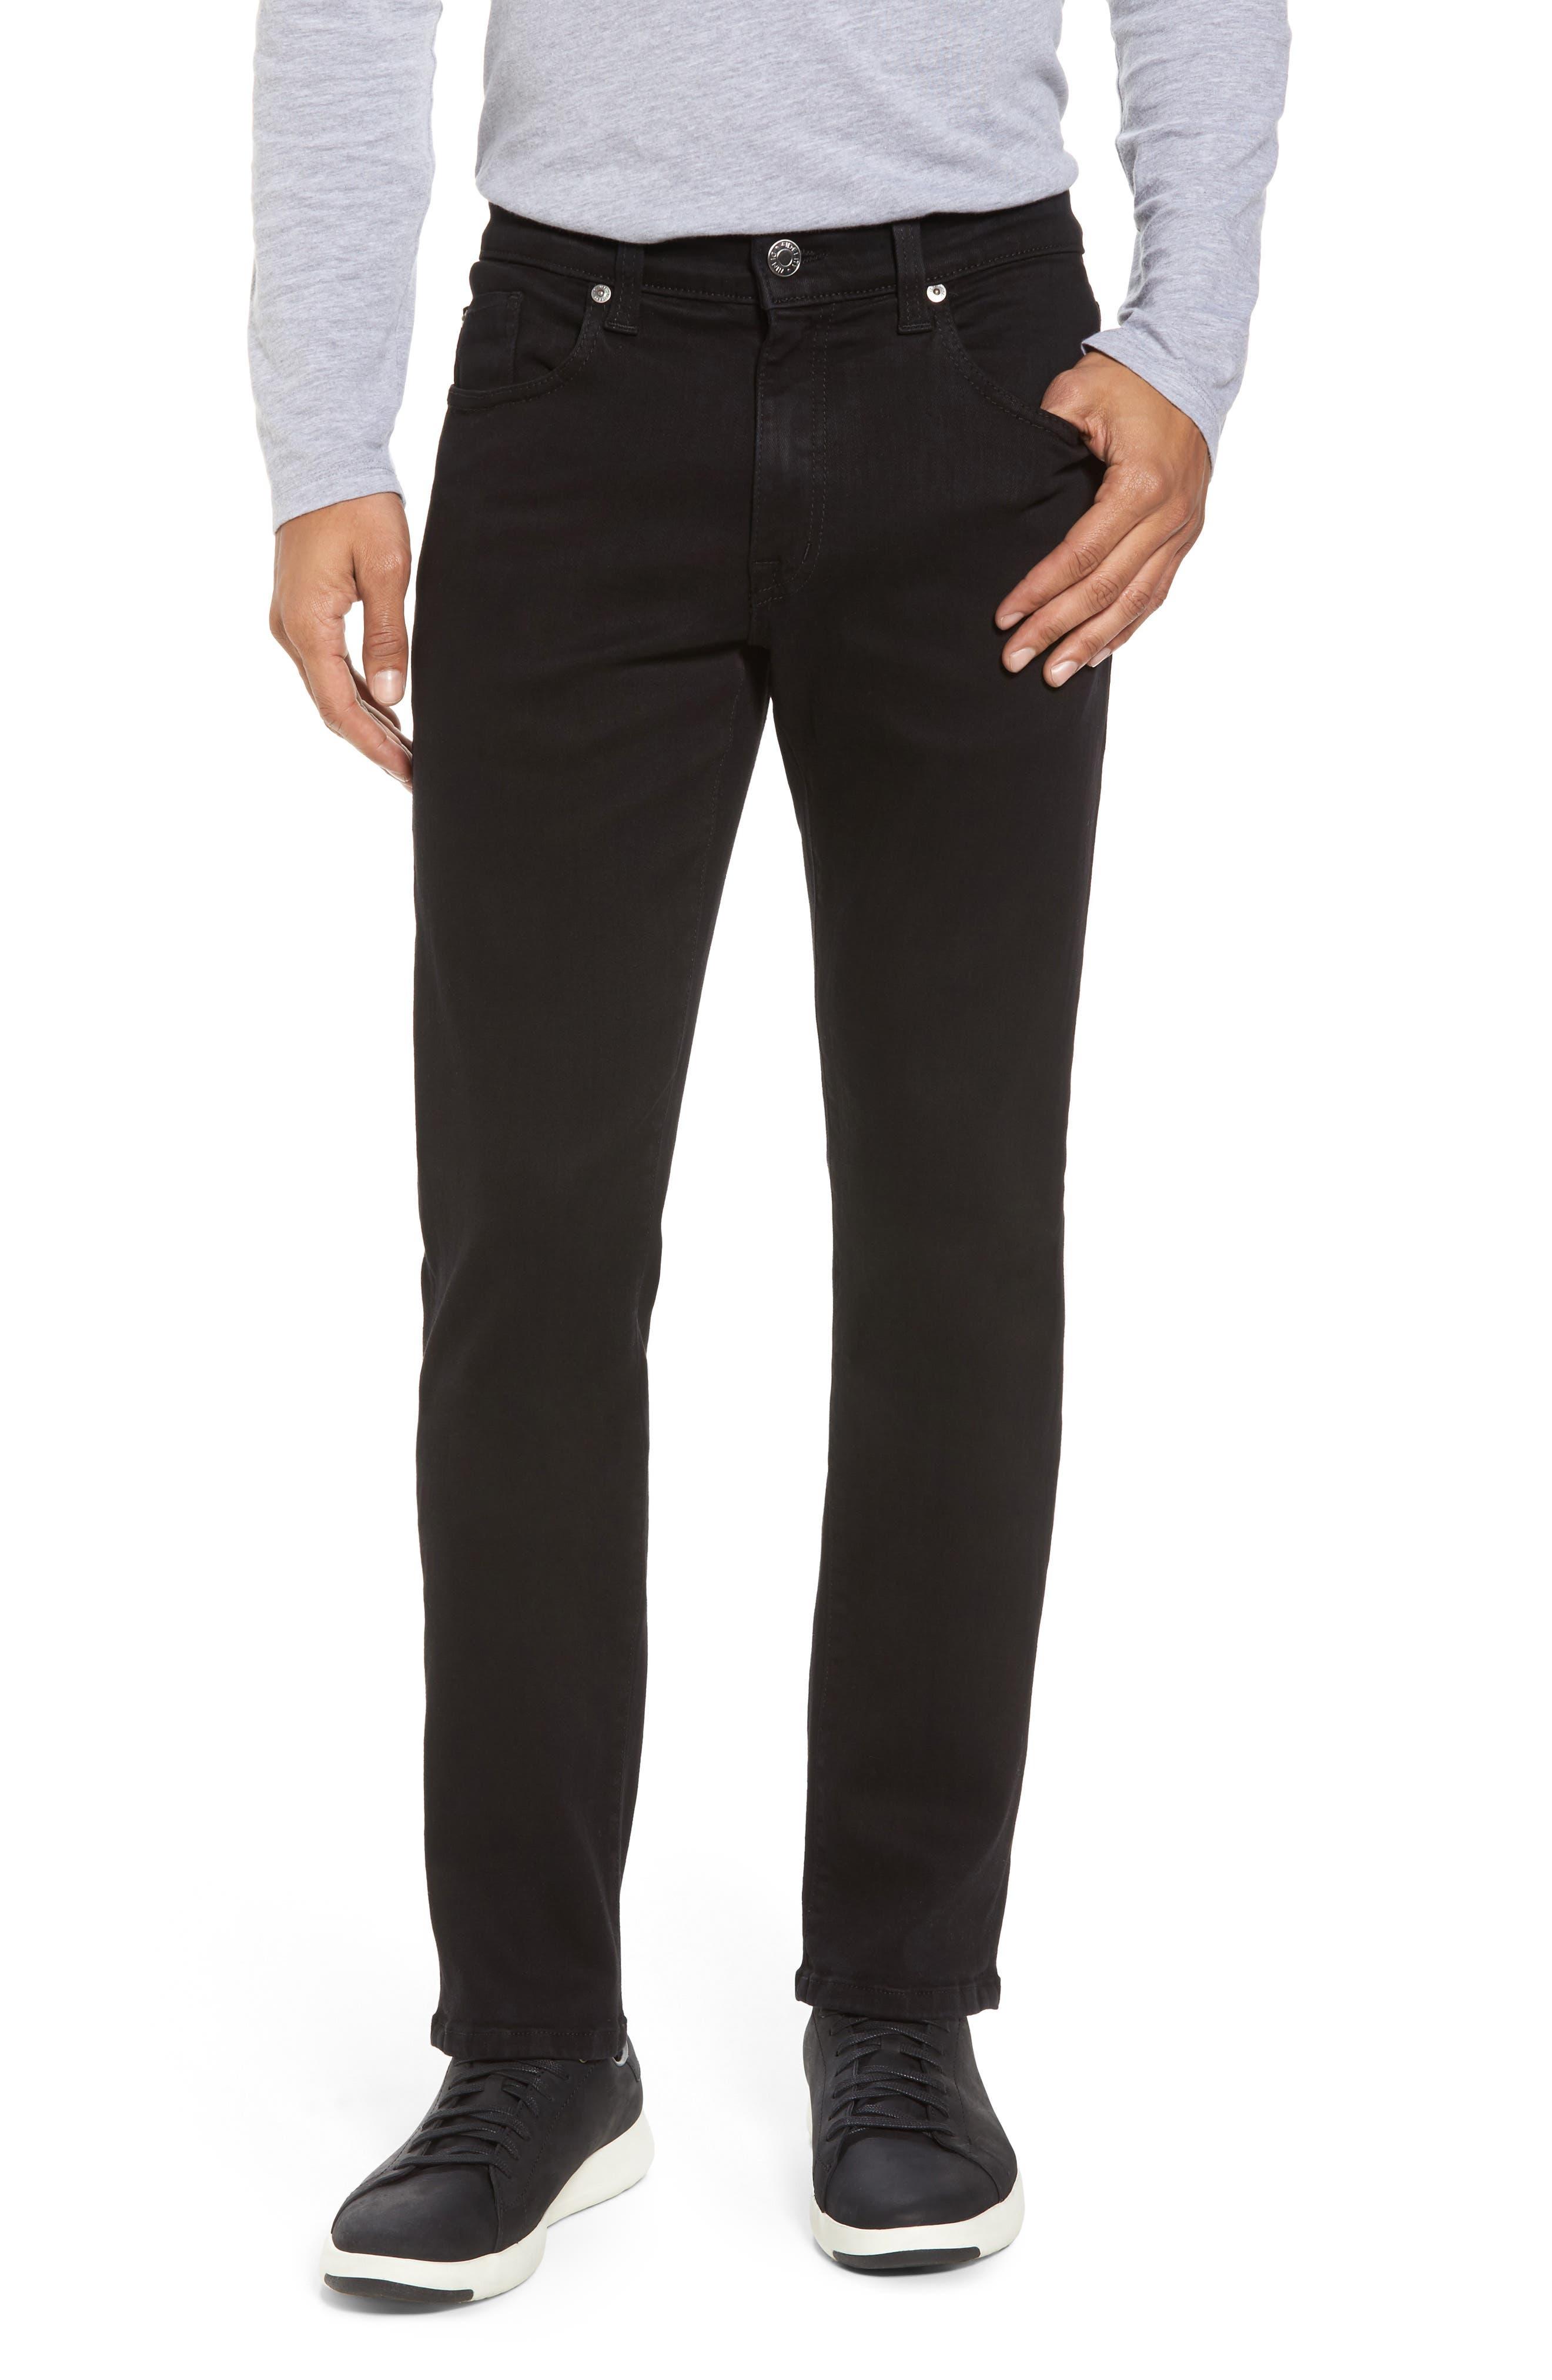 Torino Slim Fit Jeans,                         Main,                         color, Everblack